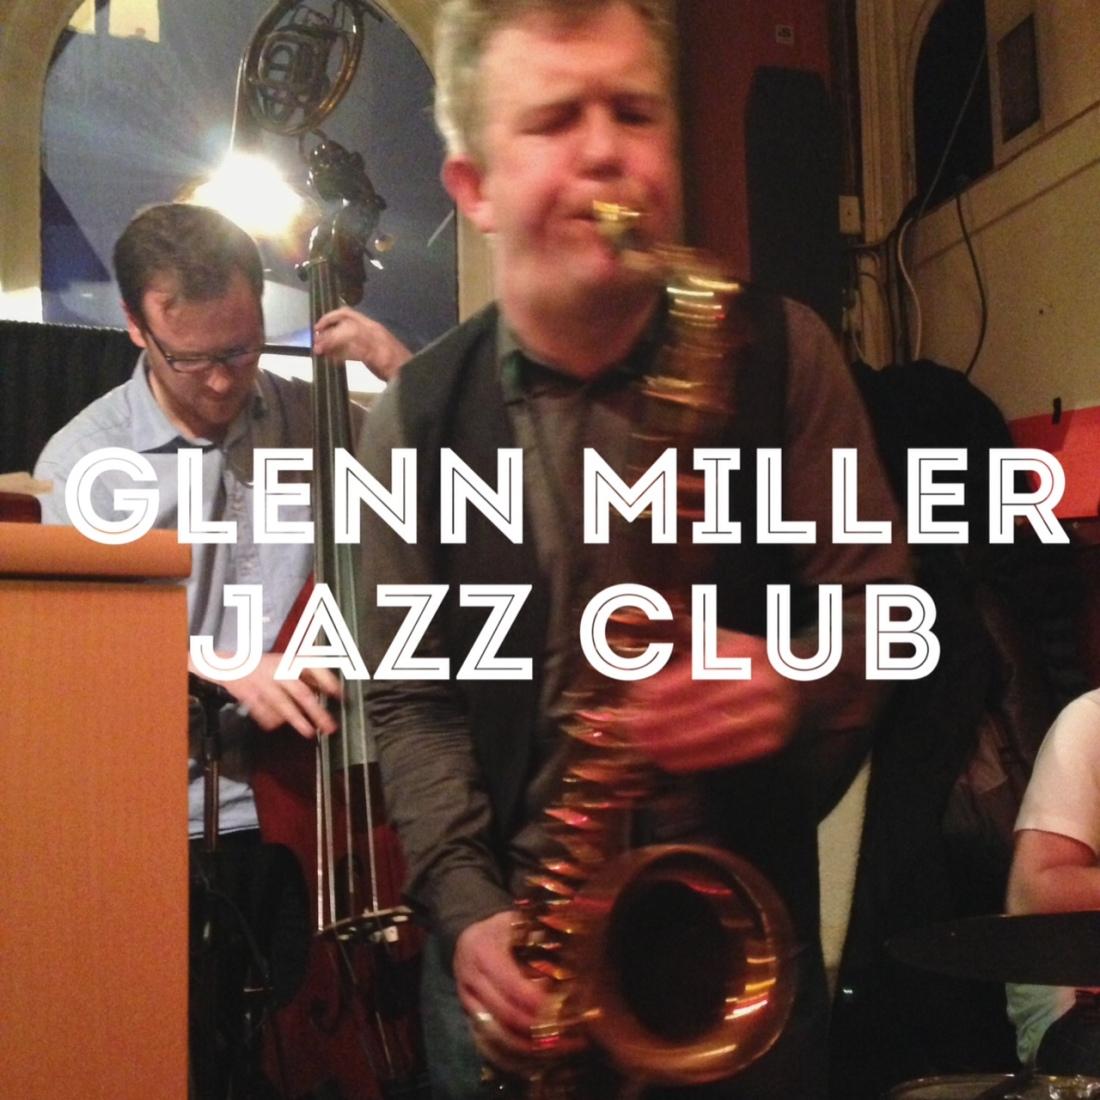 Glenn Miller Jazz Café